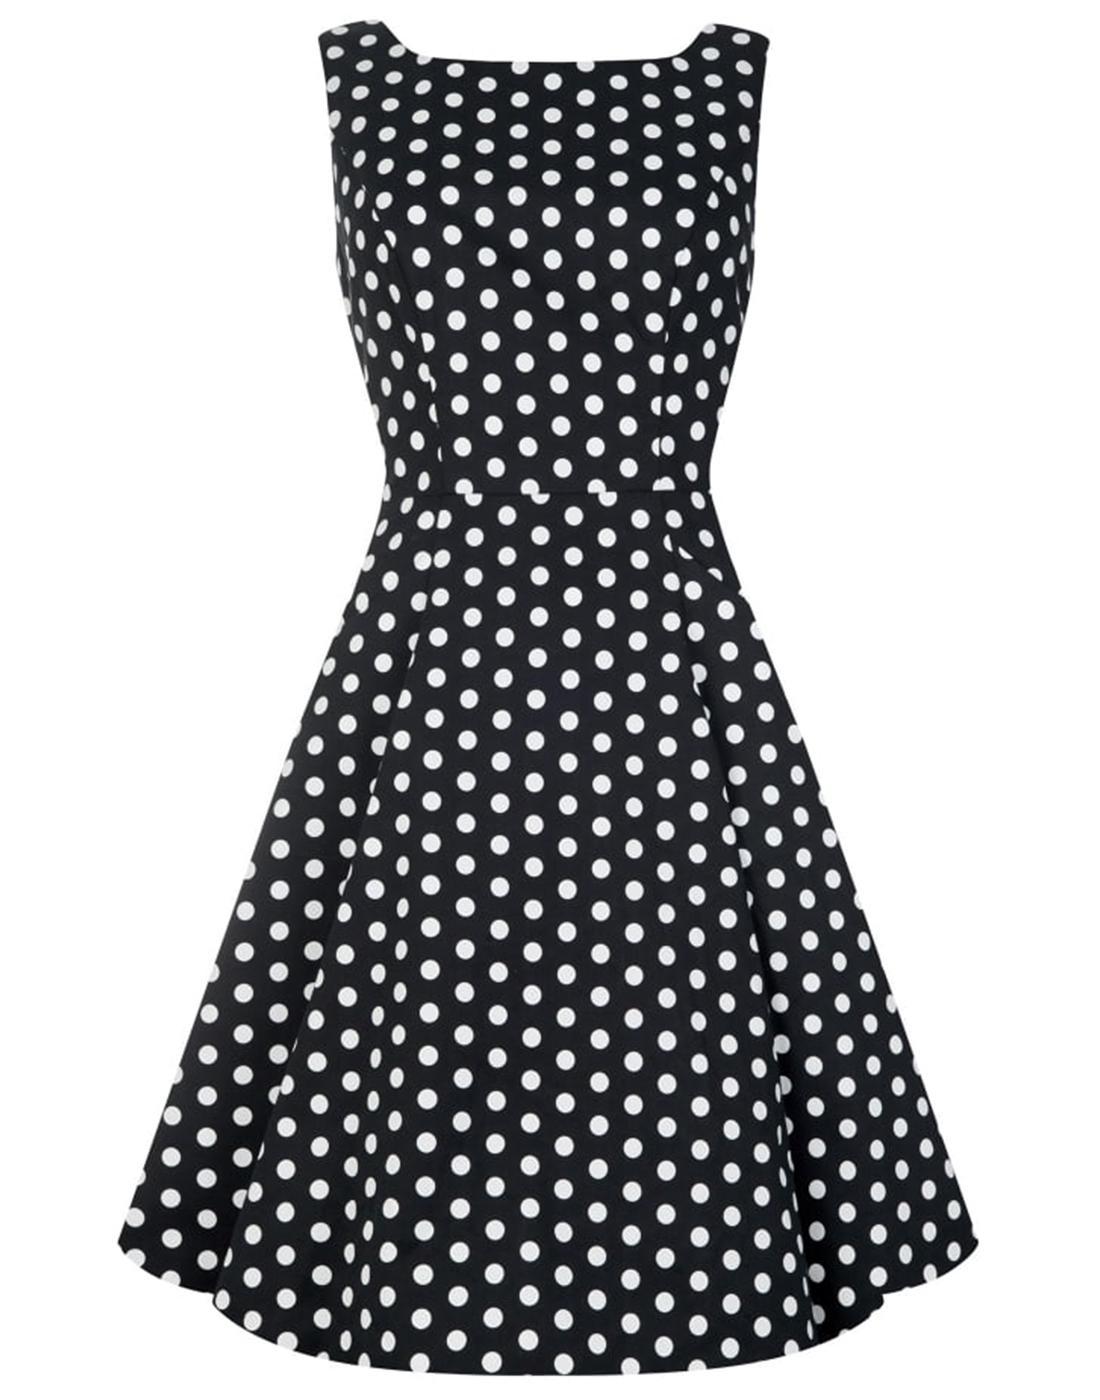 Hepburn COLLECTIF Retro 50s Polka Dot Summer Dress